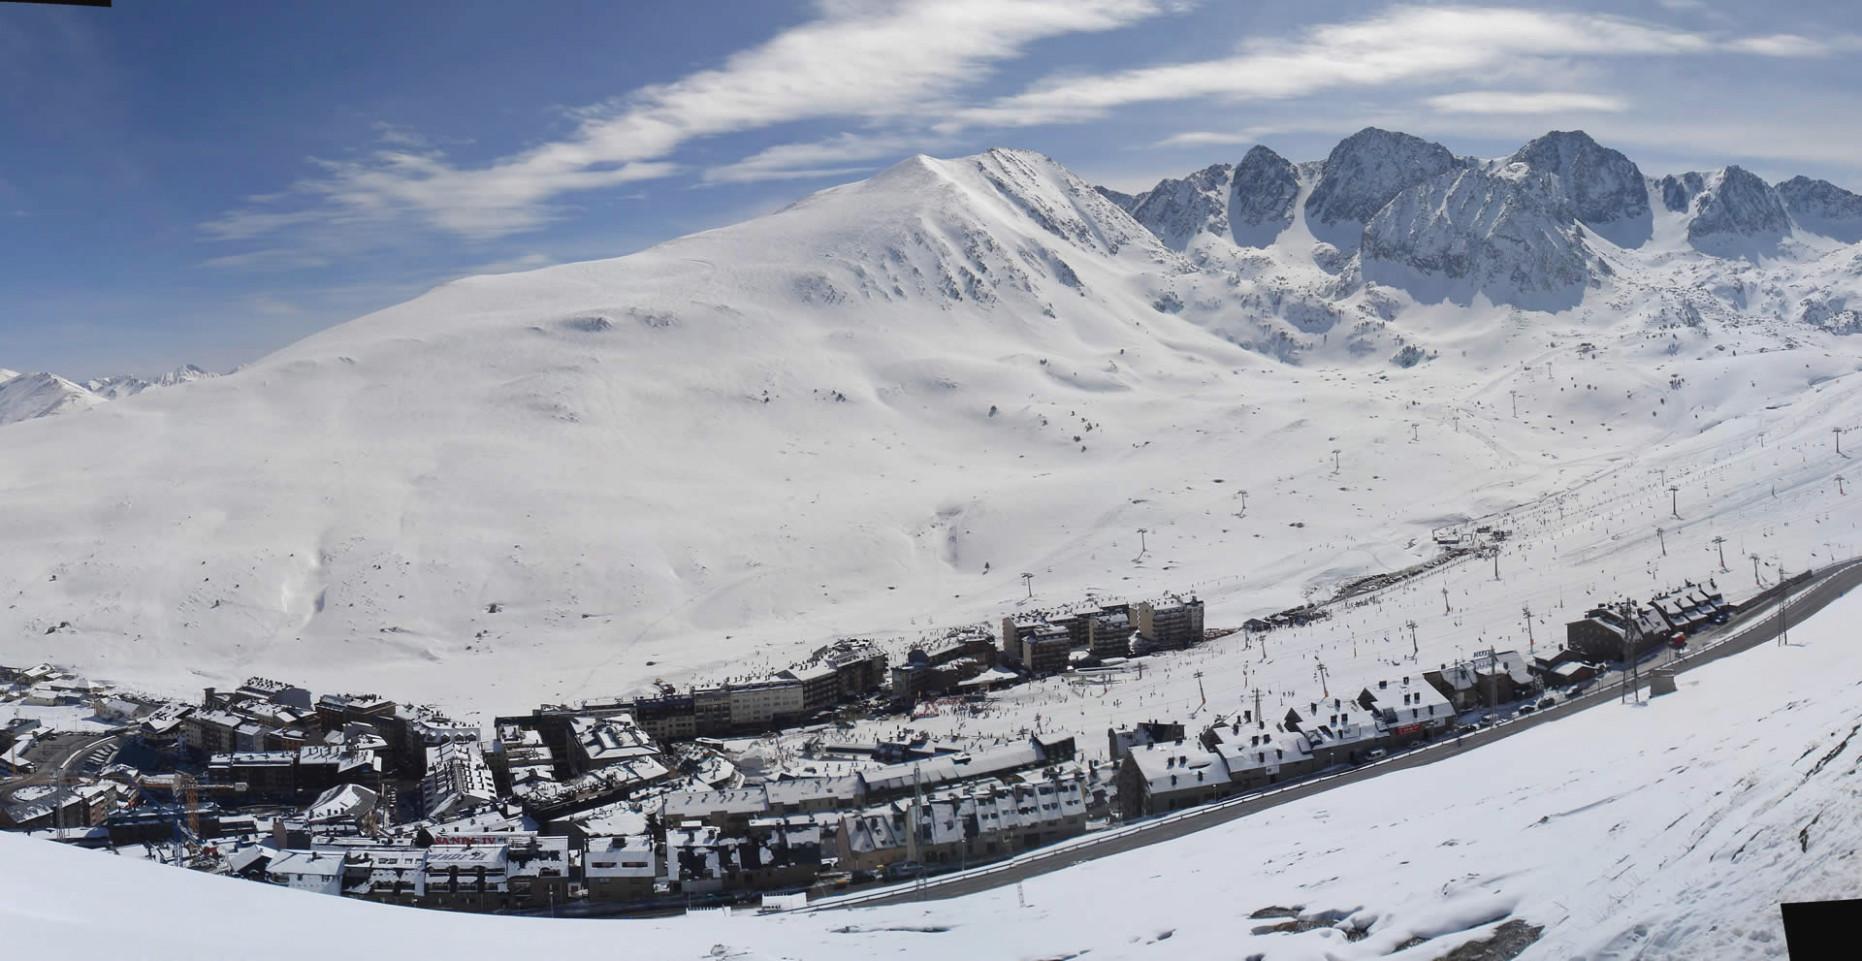 Ski sur le domaine de Grandvalira Février 2017, Pas de la casa, Encamp, Canillo, El Tarter, Soldeu, Grau-Roig Filmée avec GoPro hero 2.Andorre France station de ski snowboard Andorre.